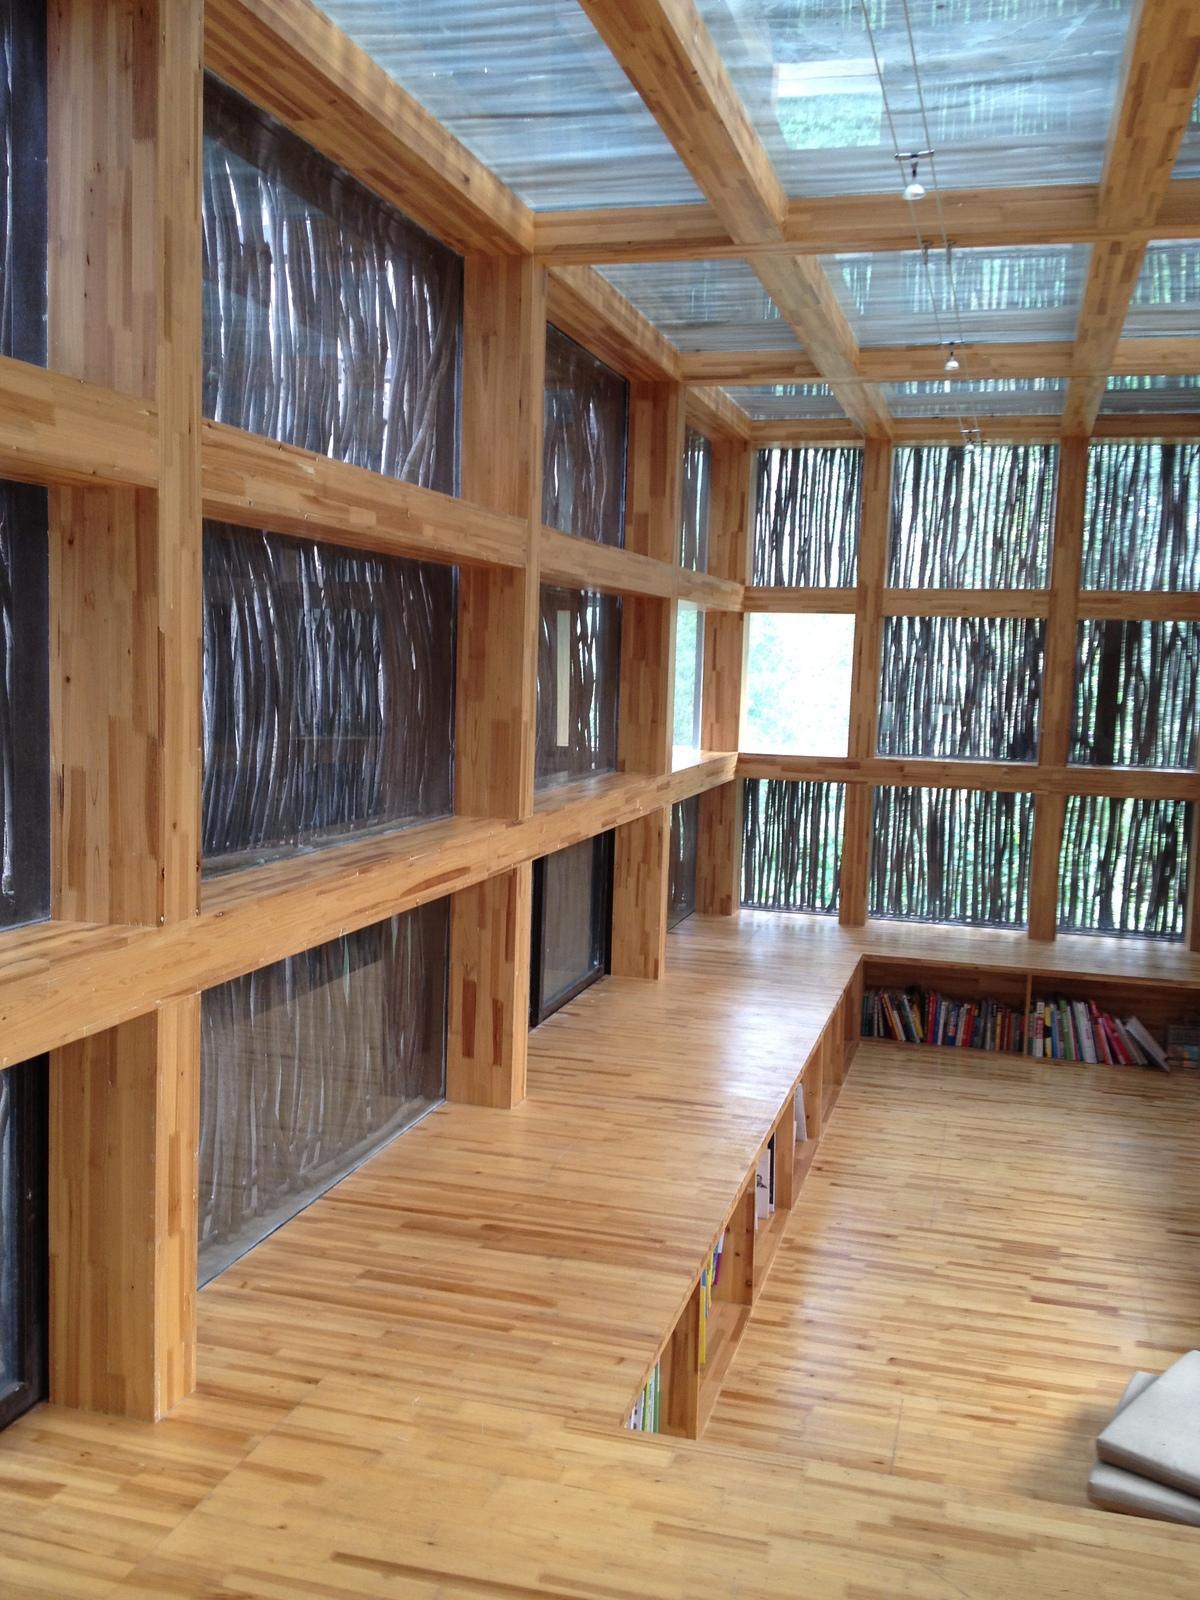 Interior reading area